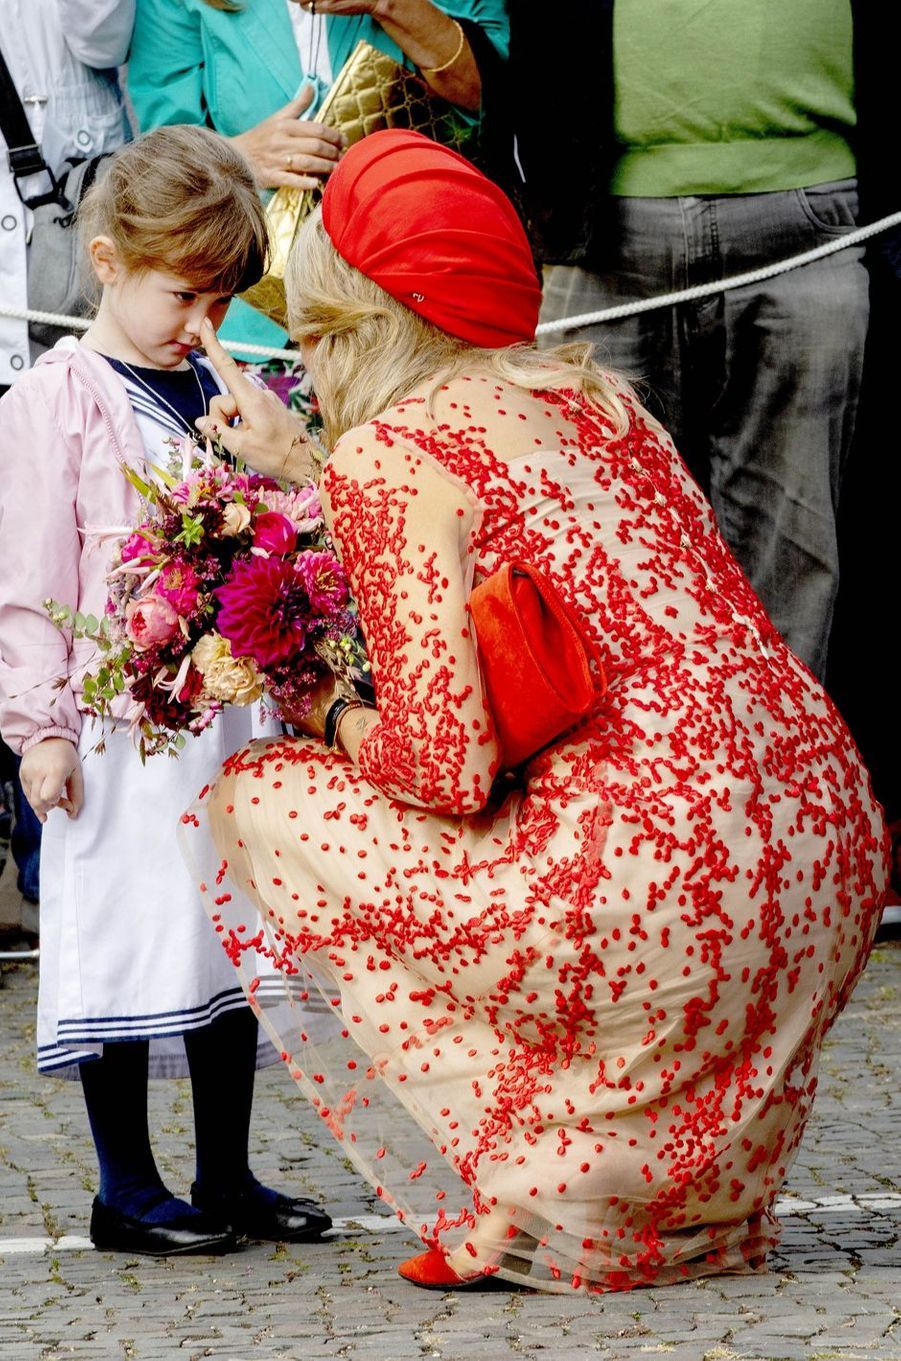 La reine Maxima des Pays-Bas à Sarrebruck, le 11 octobre 2018